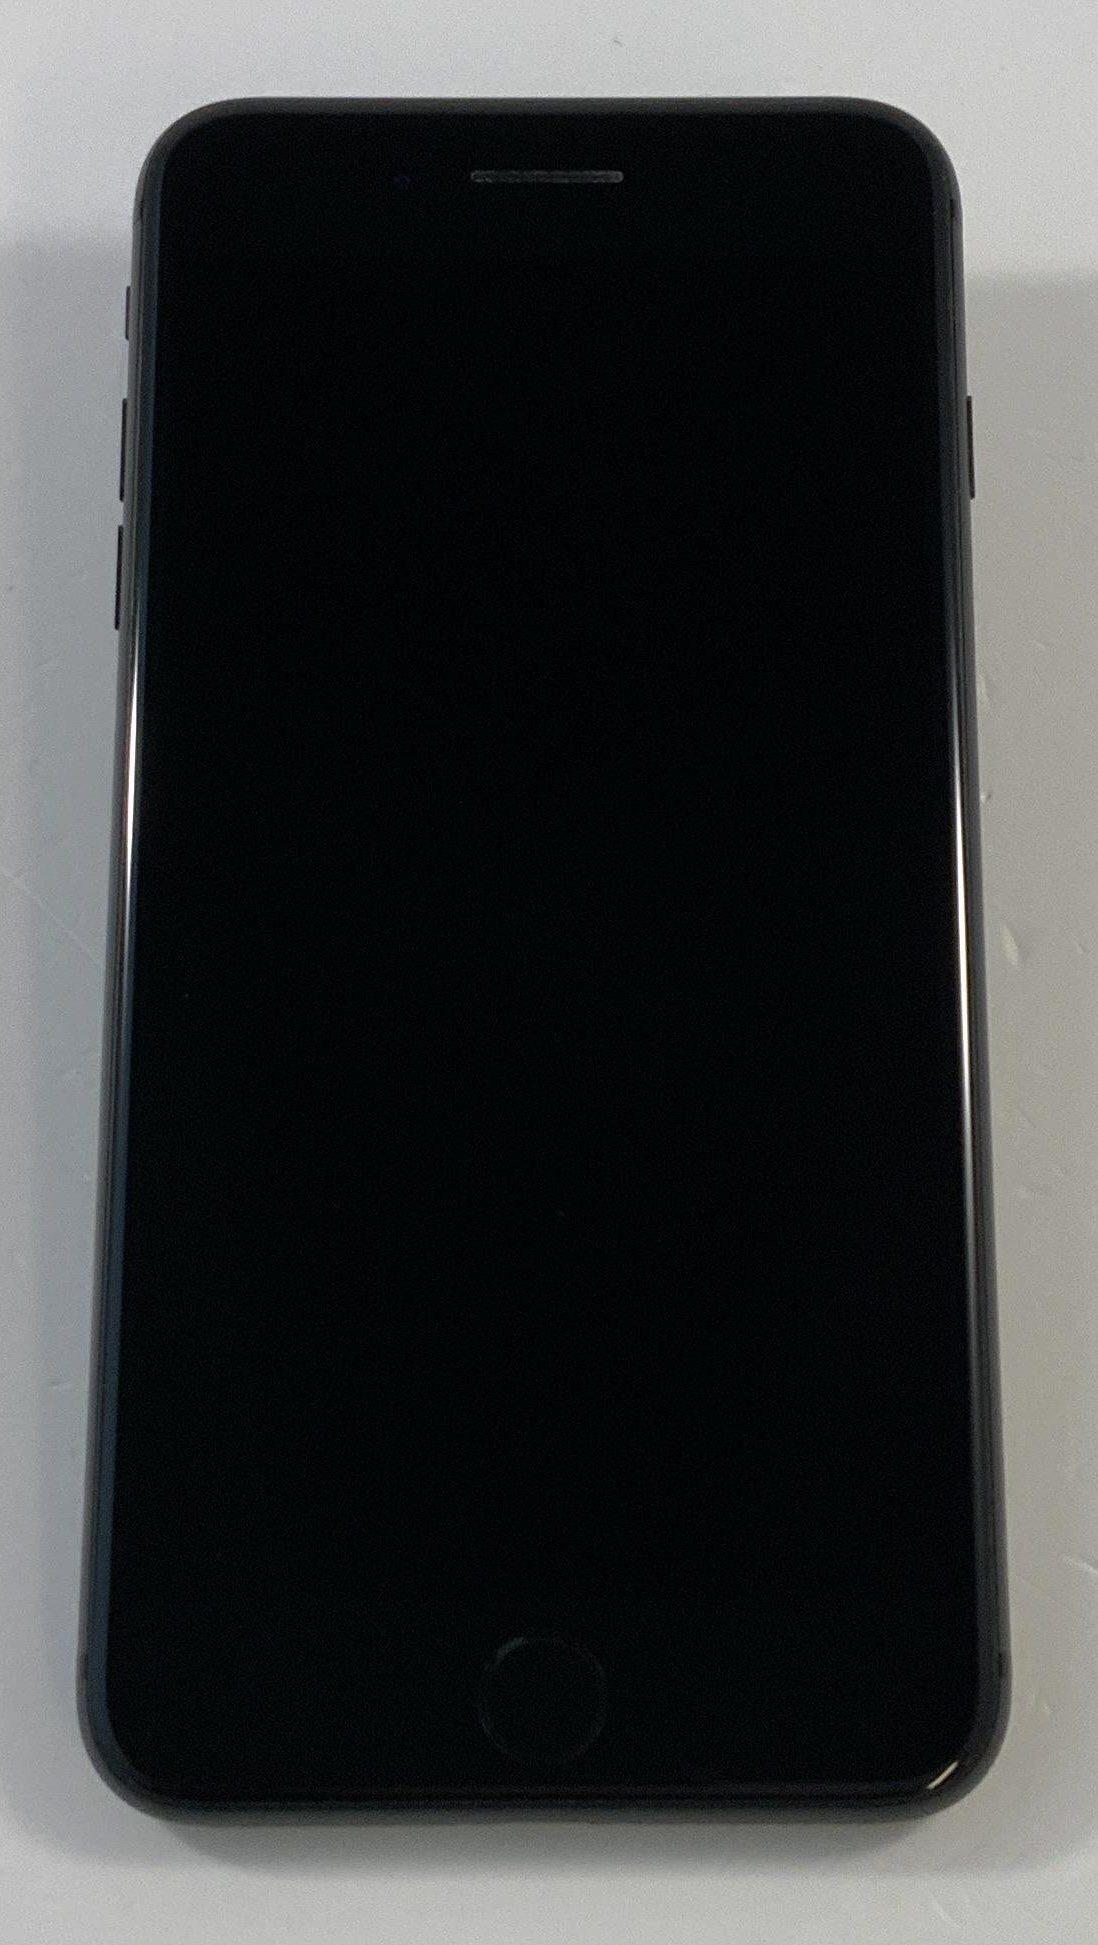 iPhone 8 Plus 64GB, 64GB, Space Gray, immagine 1